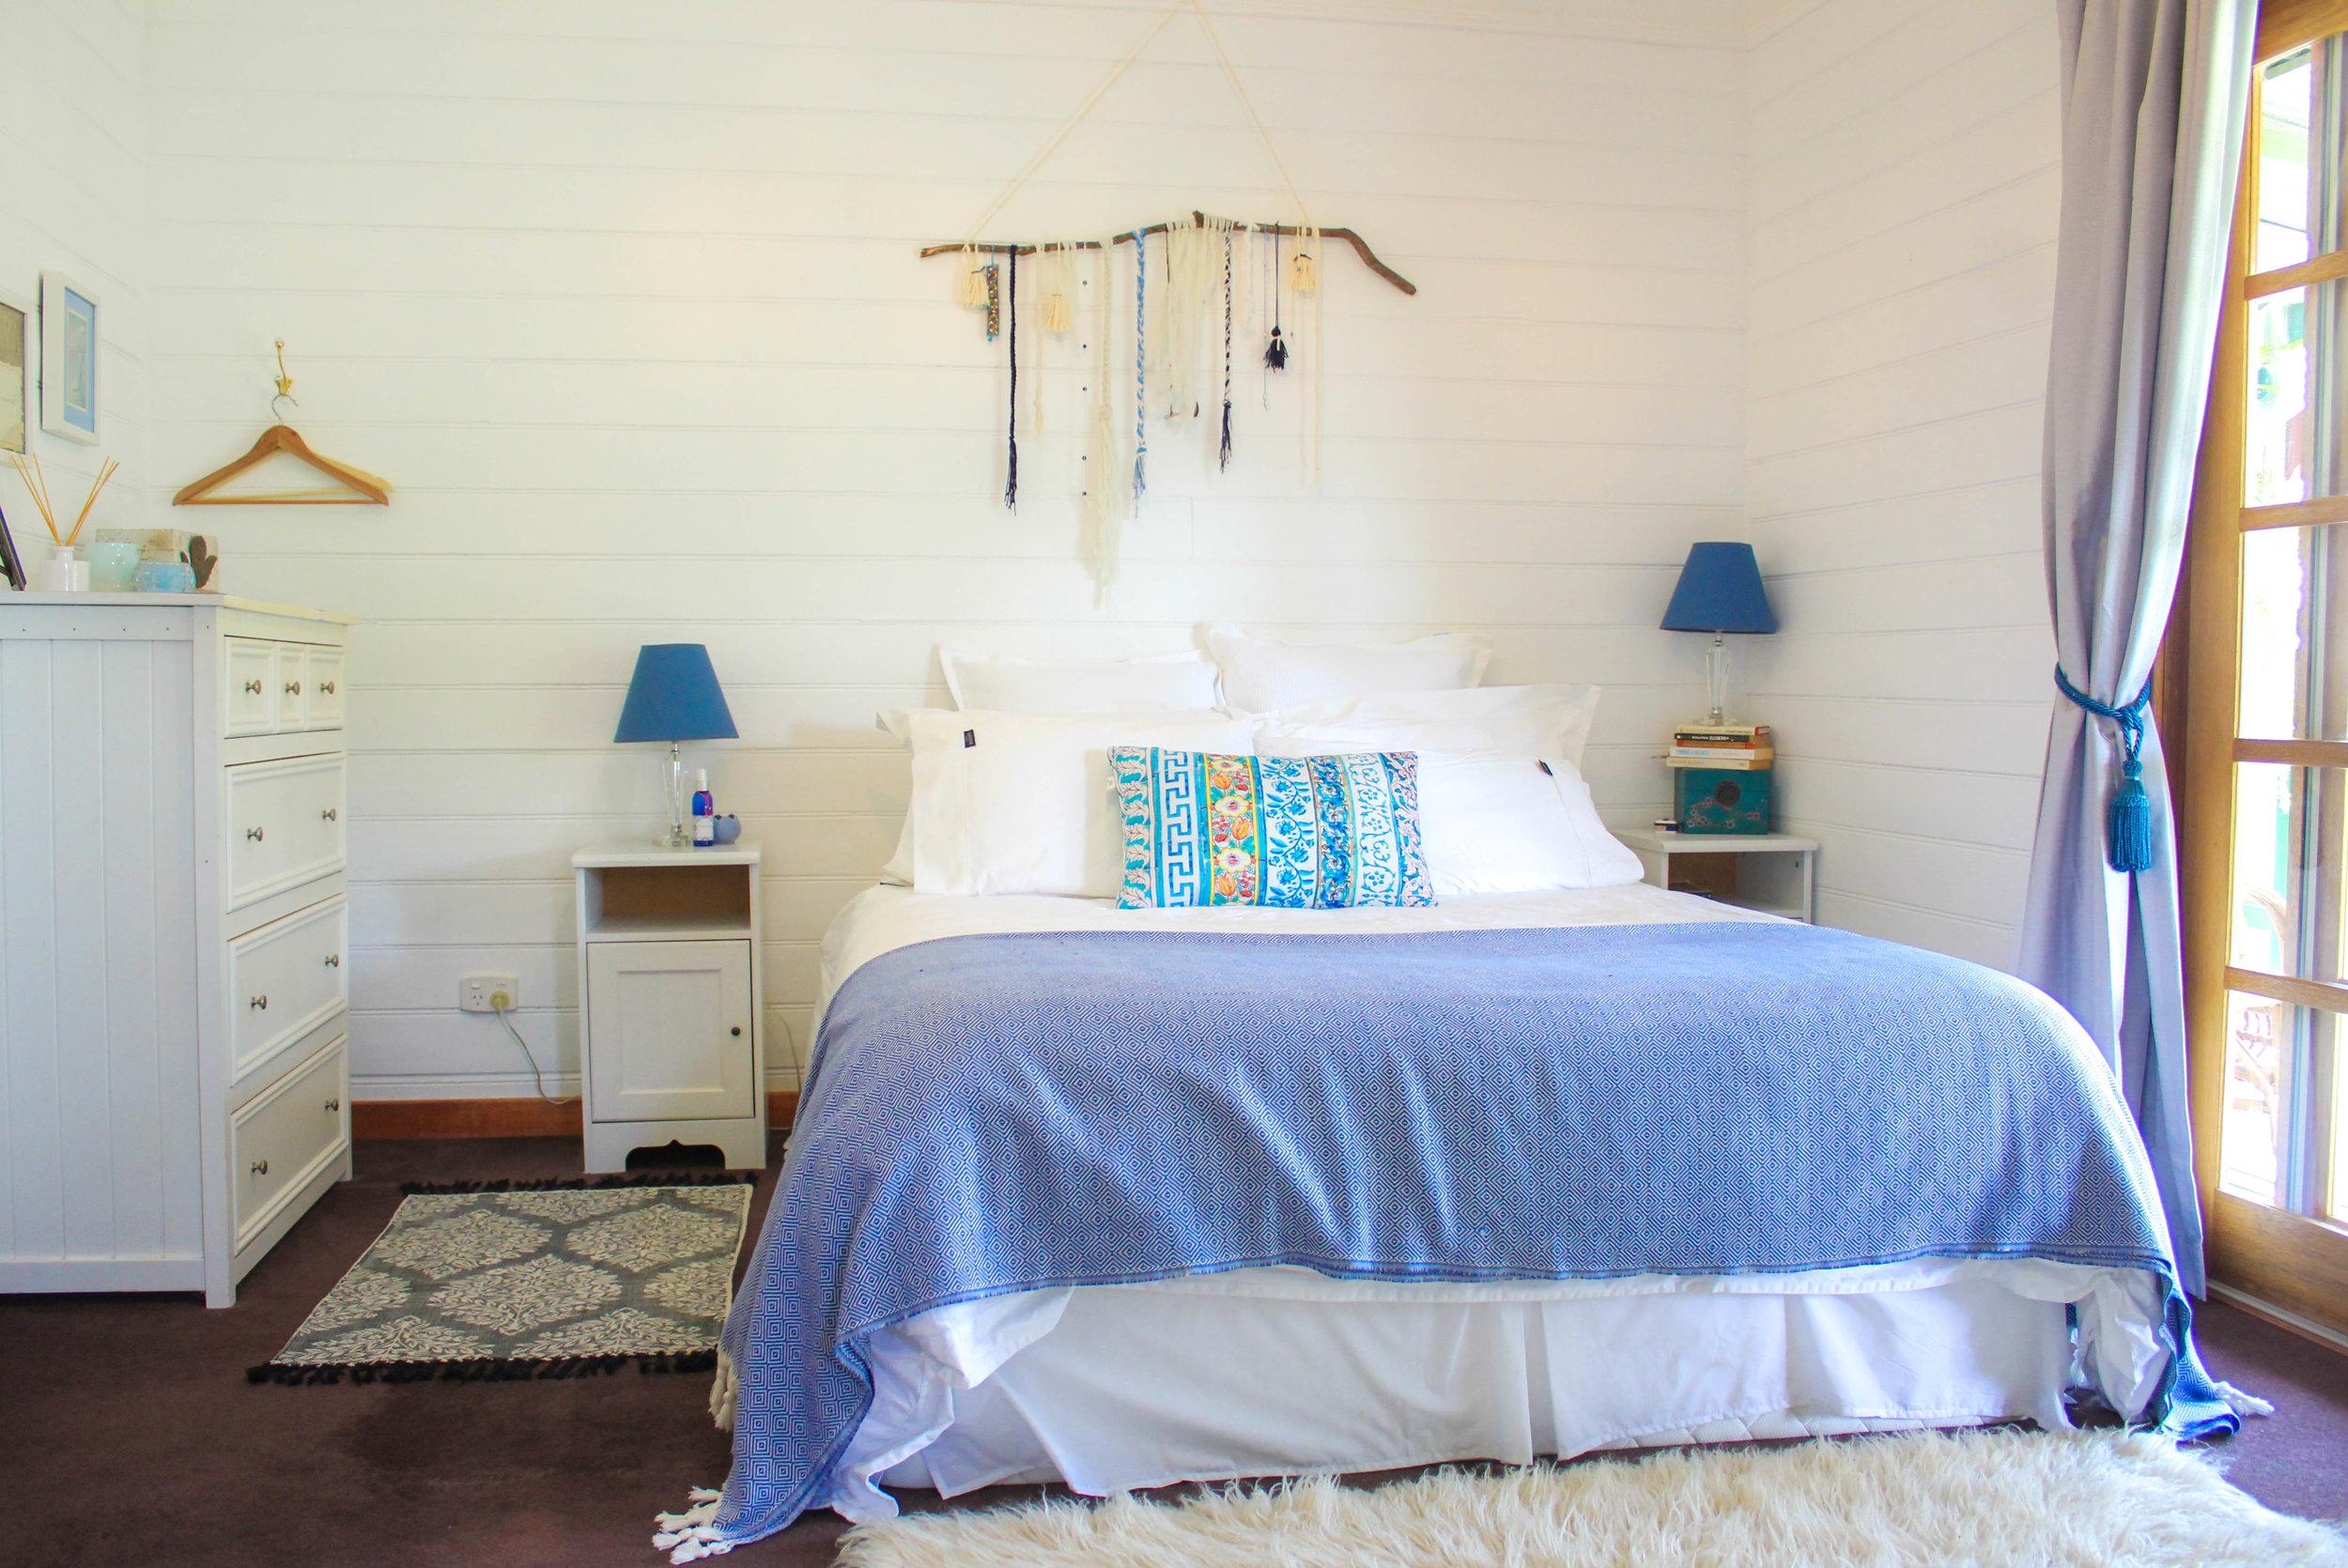 glft-billabong-cottage-Cornflower-room-bnb.jpg